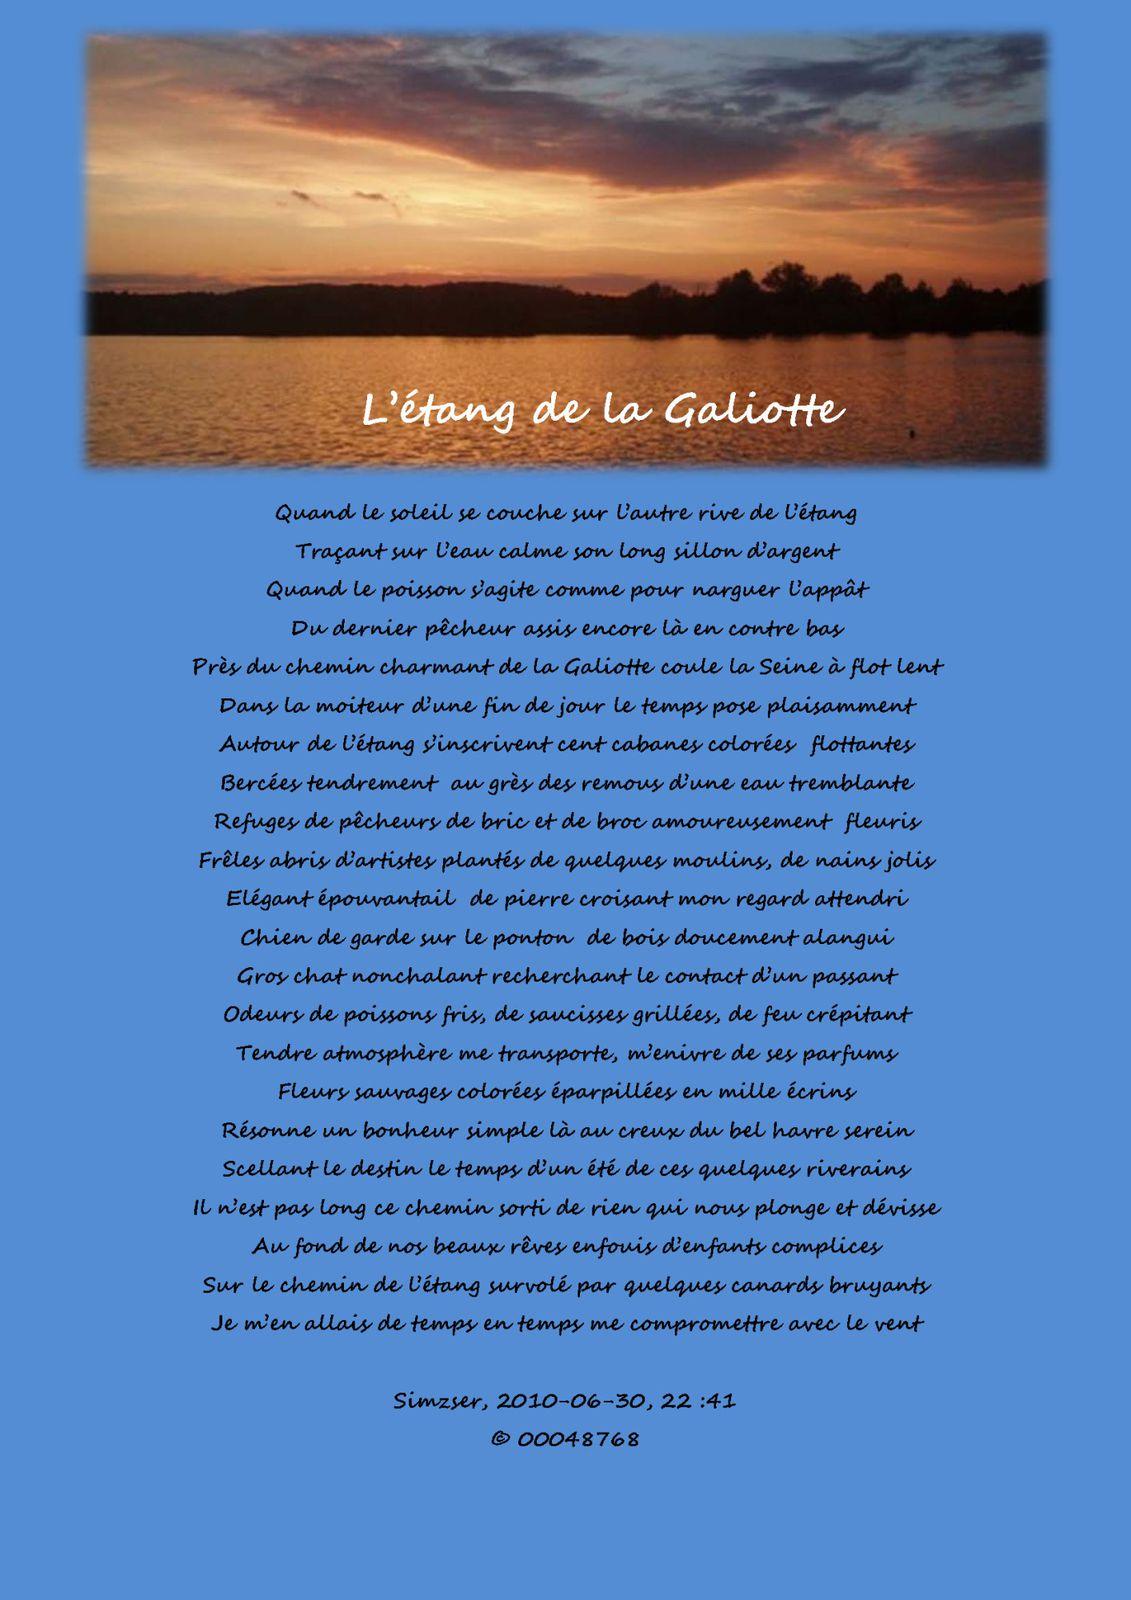 La-Galliotte-copie-2.jpg